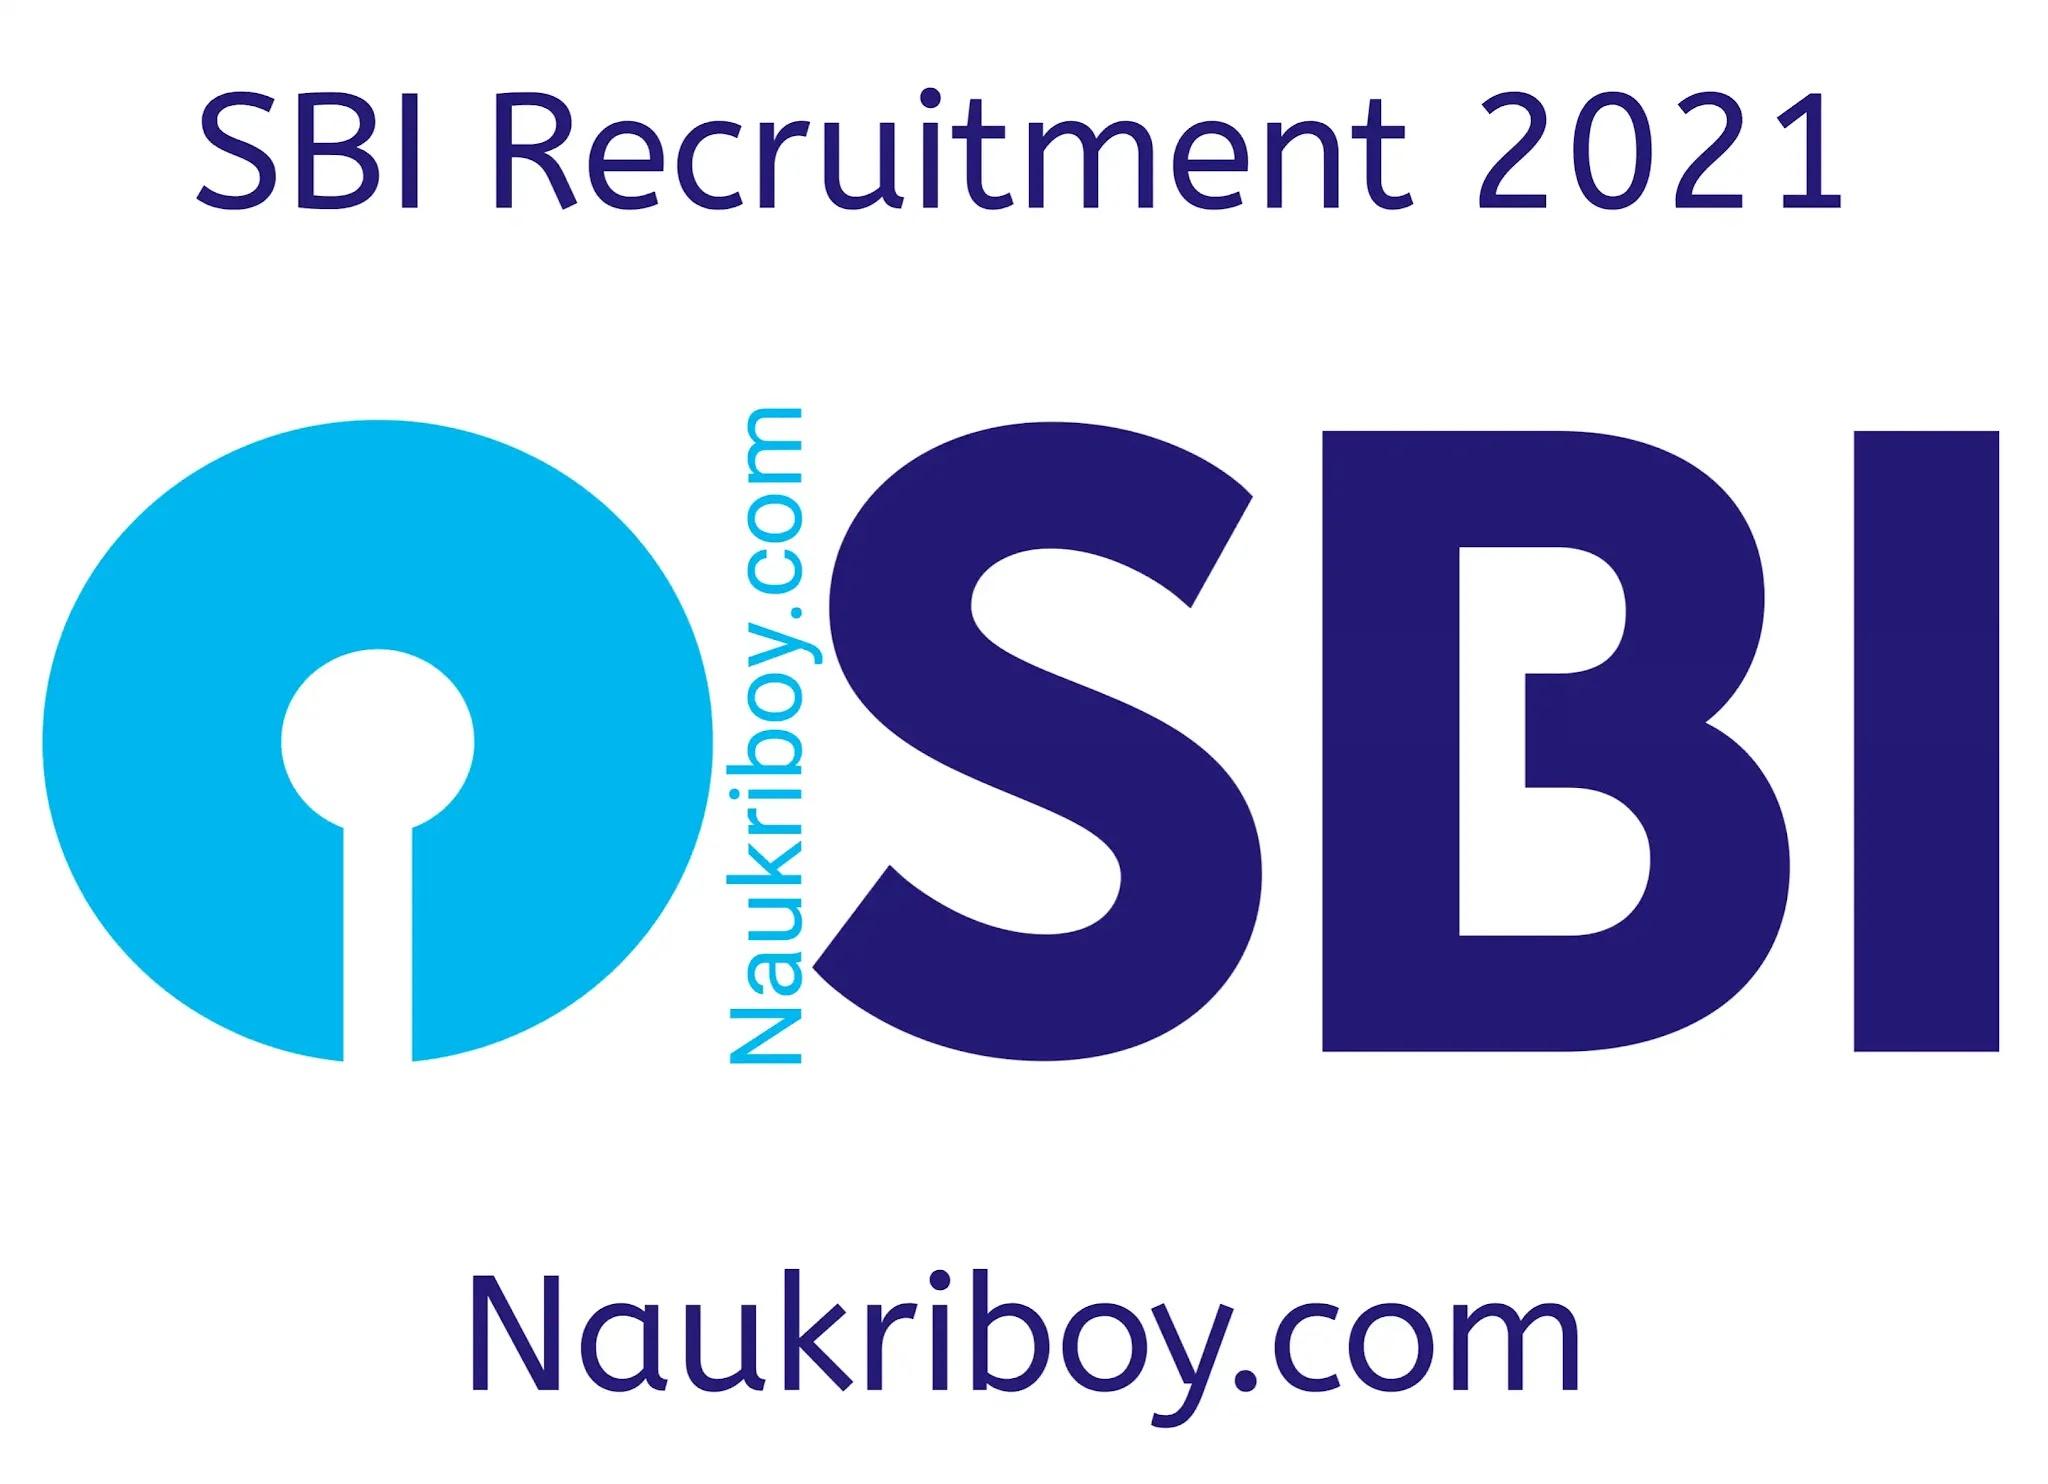 sbi 2021 sbi bank recruitment 2021 sbi bank bharti 2021 bank jobs 2021 letest bank job 2021 naukriboy.com